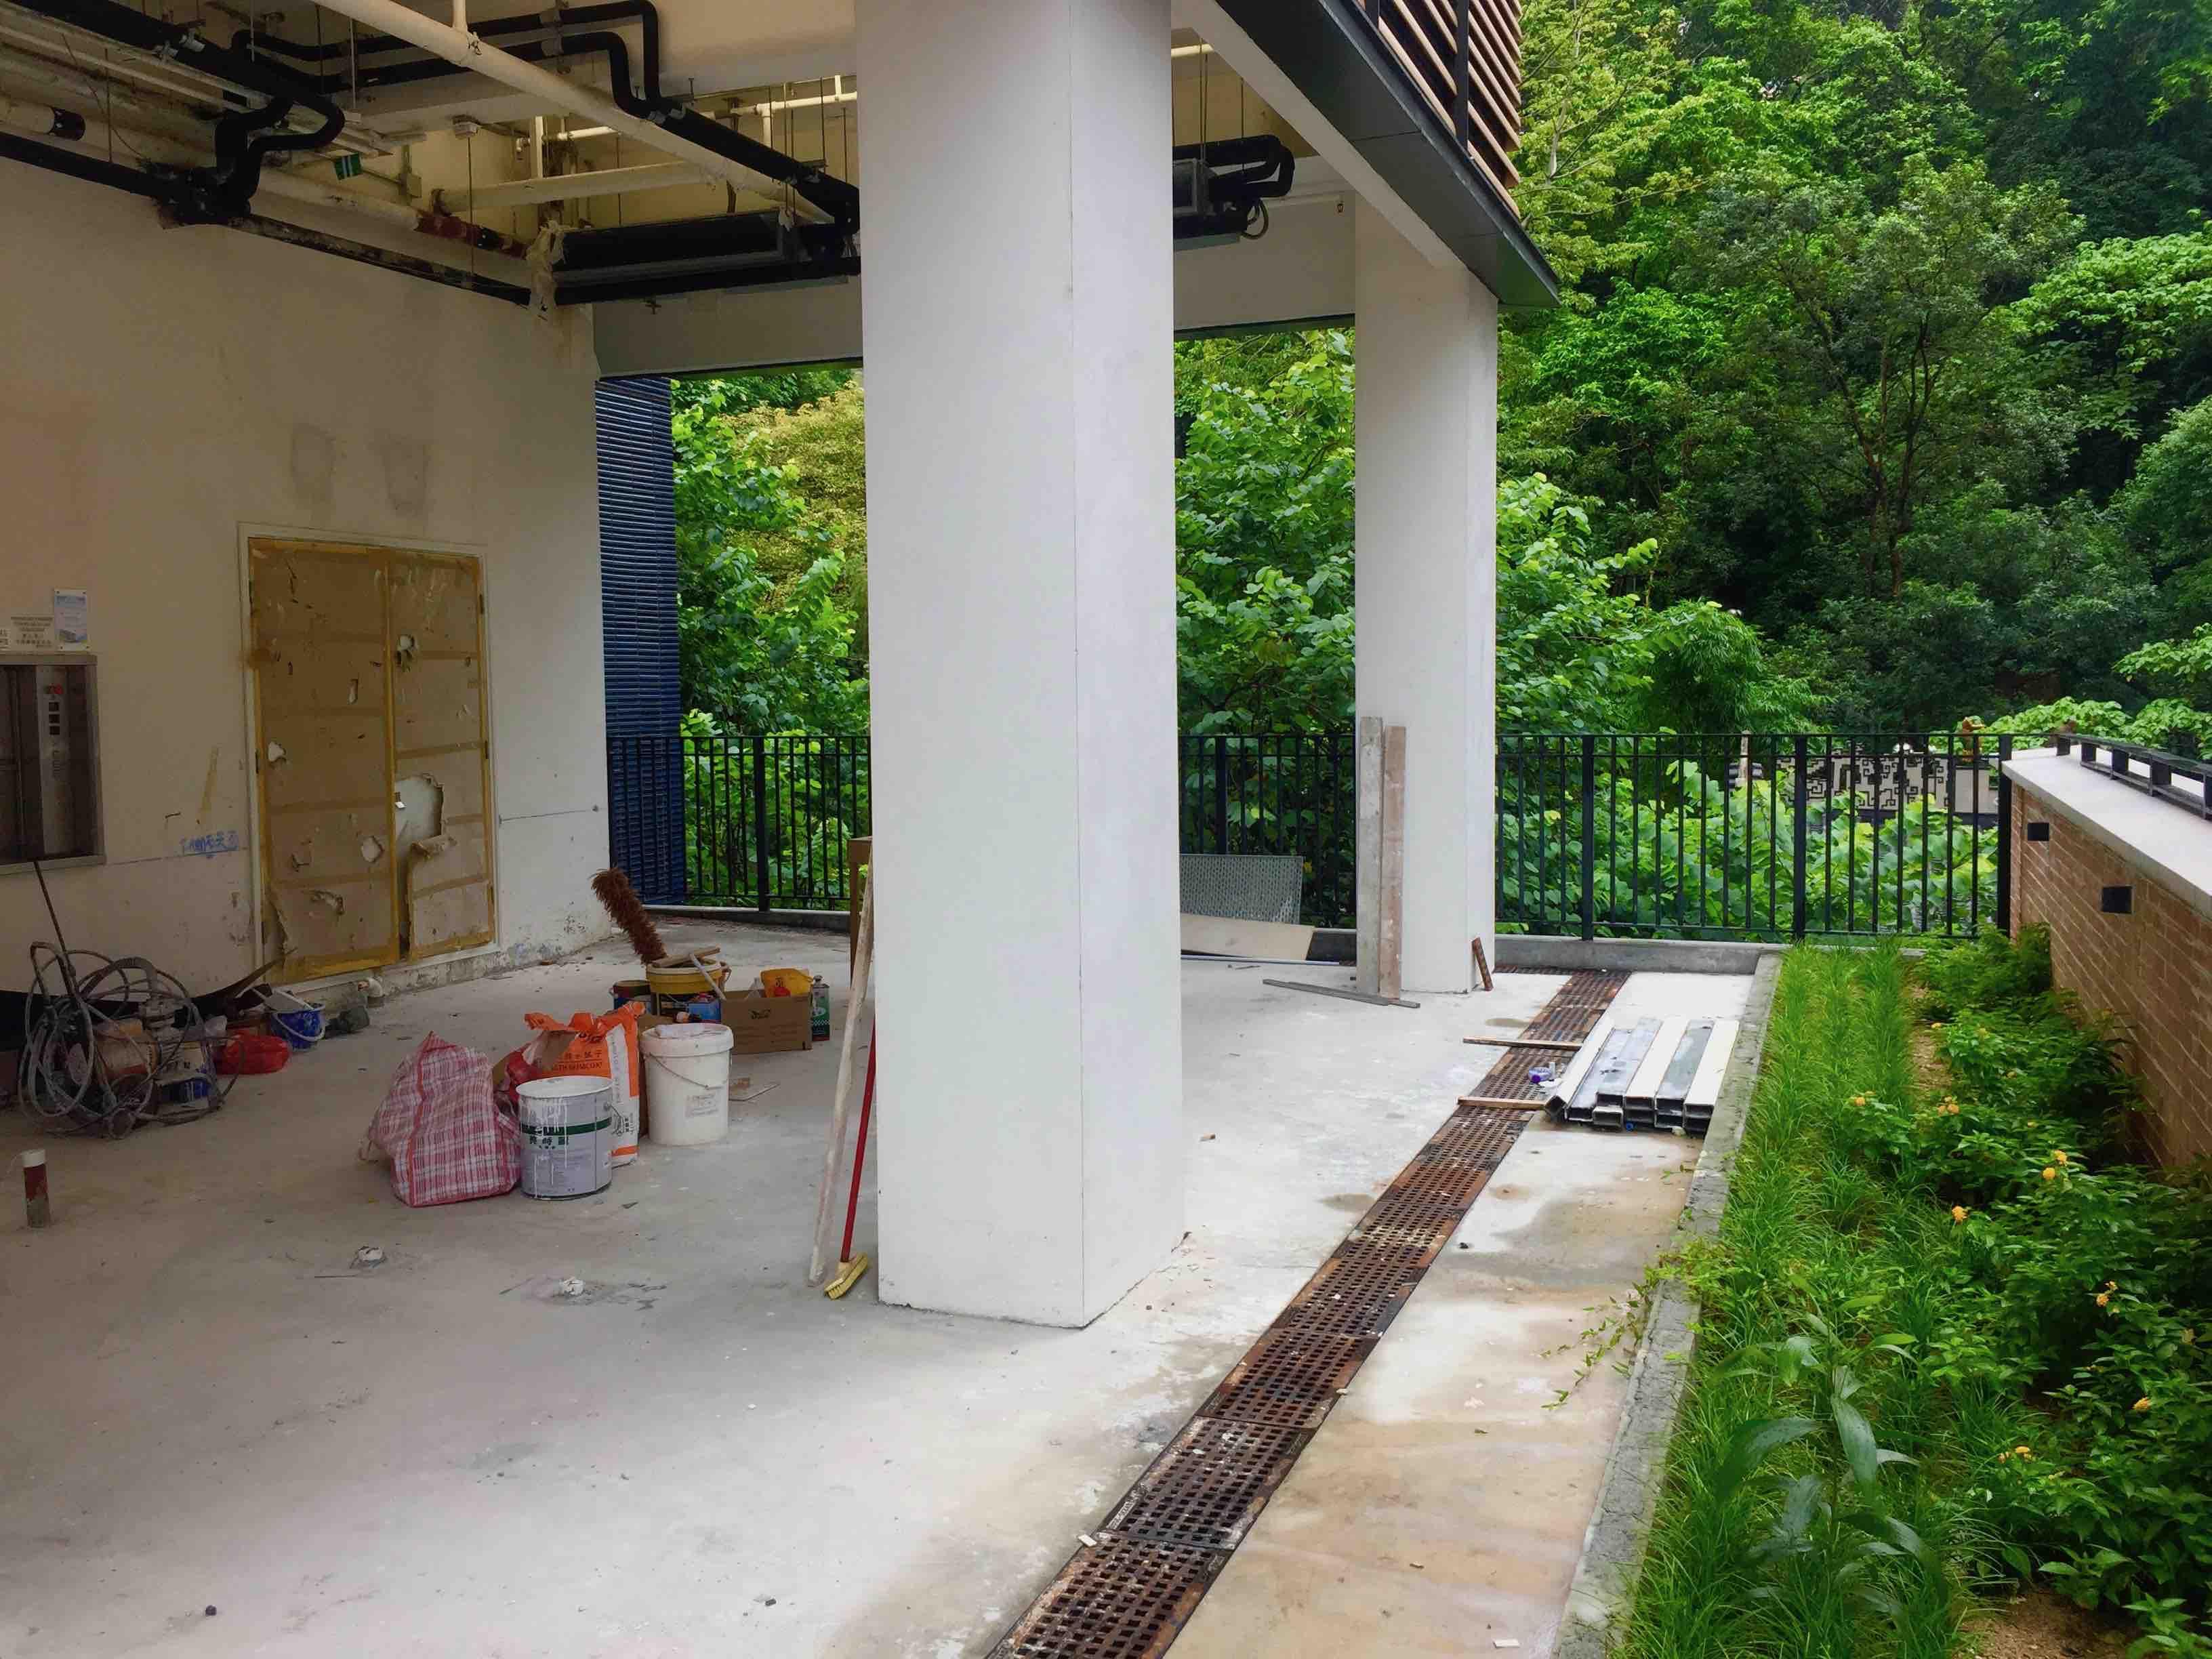 Huge Roof Restaurant & Bar Space for Rent in Tai Hang Hong Kong